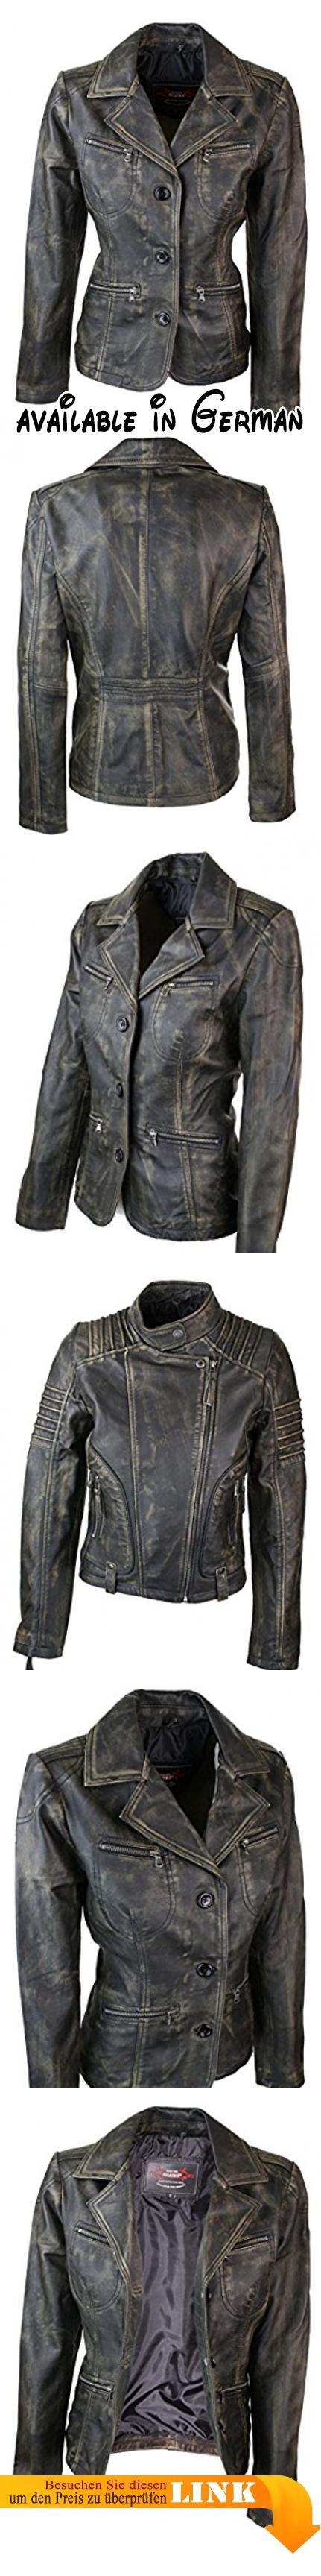 B06Y61K41R   Damenjacke 100% Echtleder Schwarz Braun Eng Tailliert Vintage  Gold. weiches Nappa Leder c00c801a18